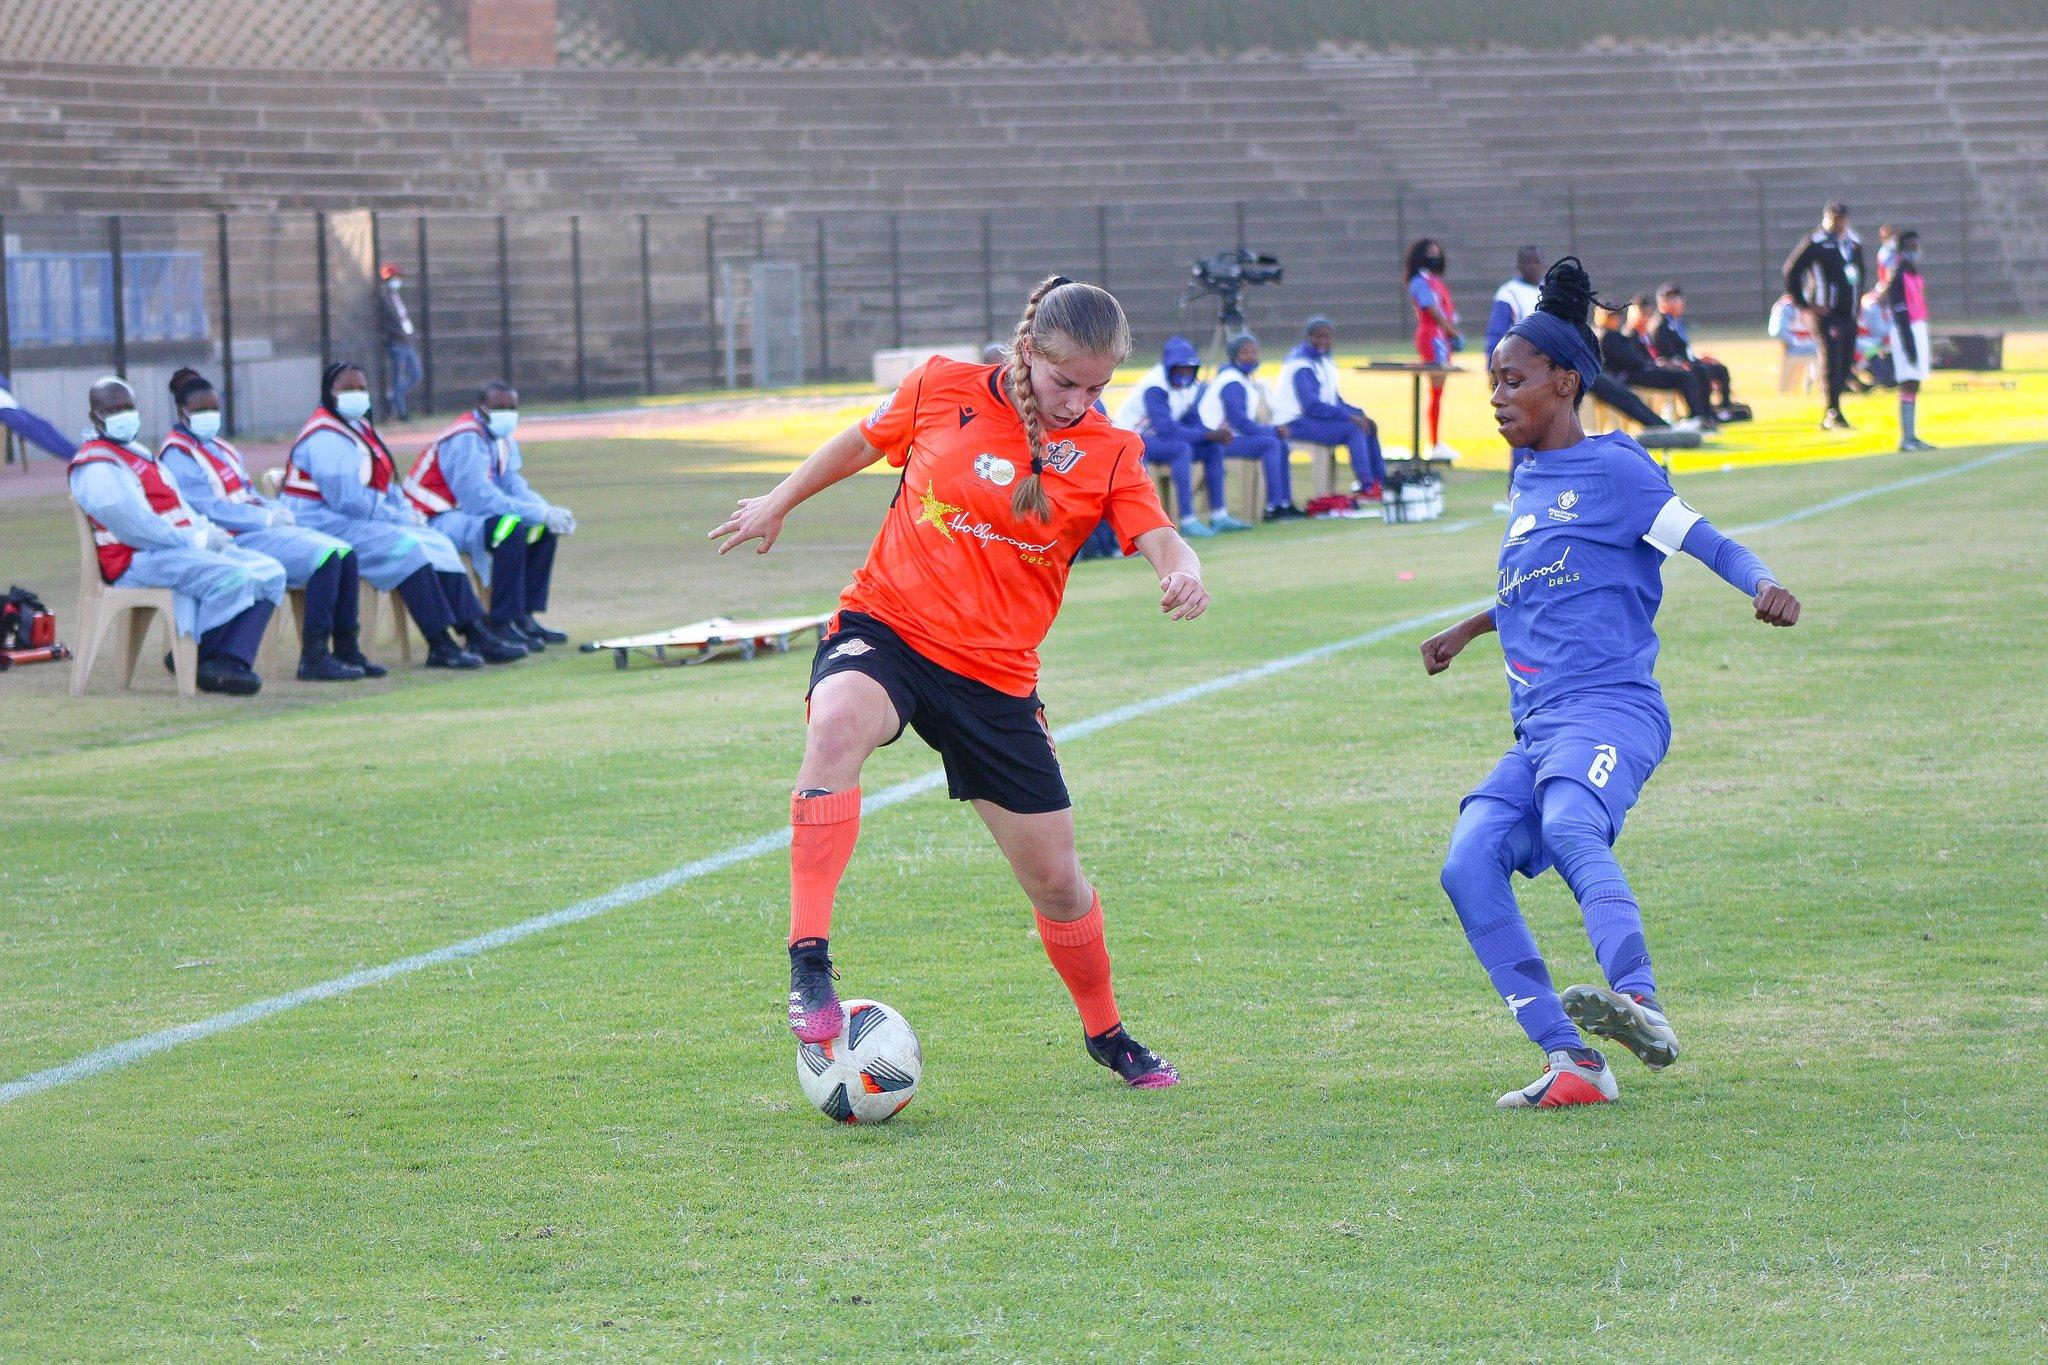 UJ Ladies midfielder Jessica Wade